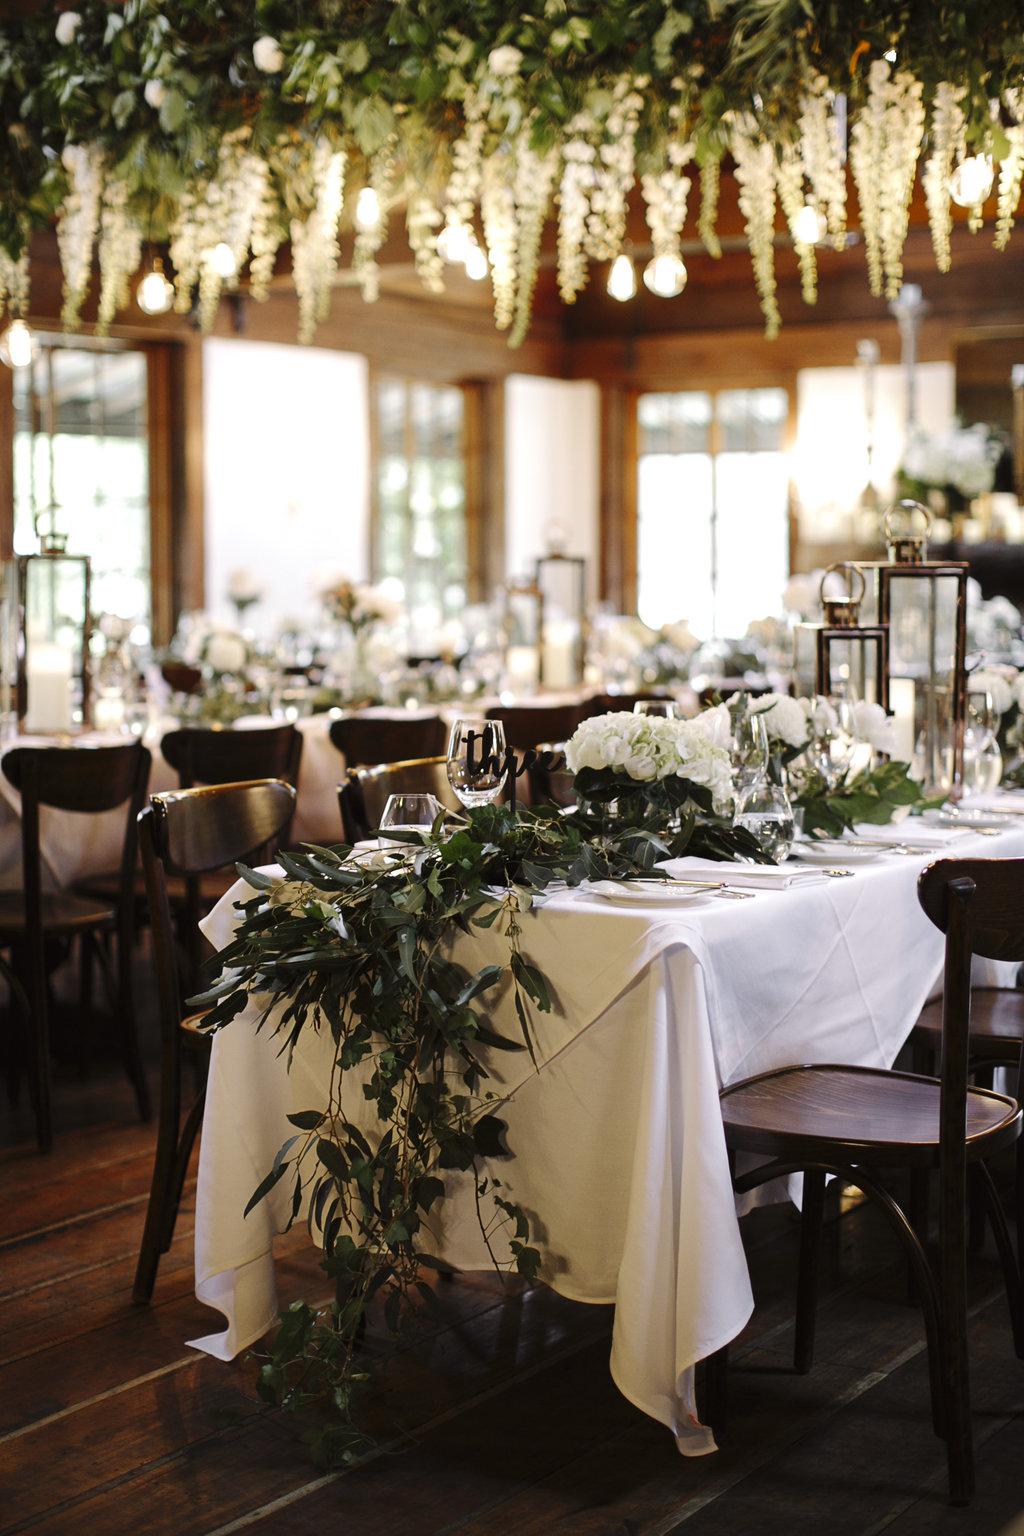 171118_justinaaron_wedding_danielle_michael_h-148.jpg